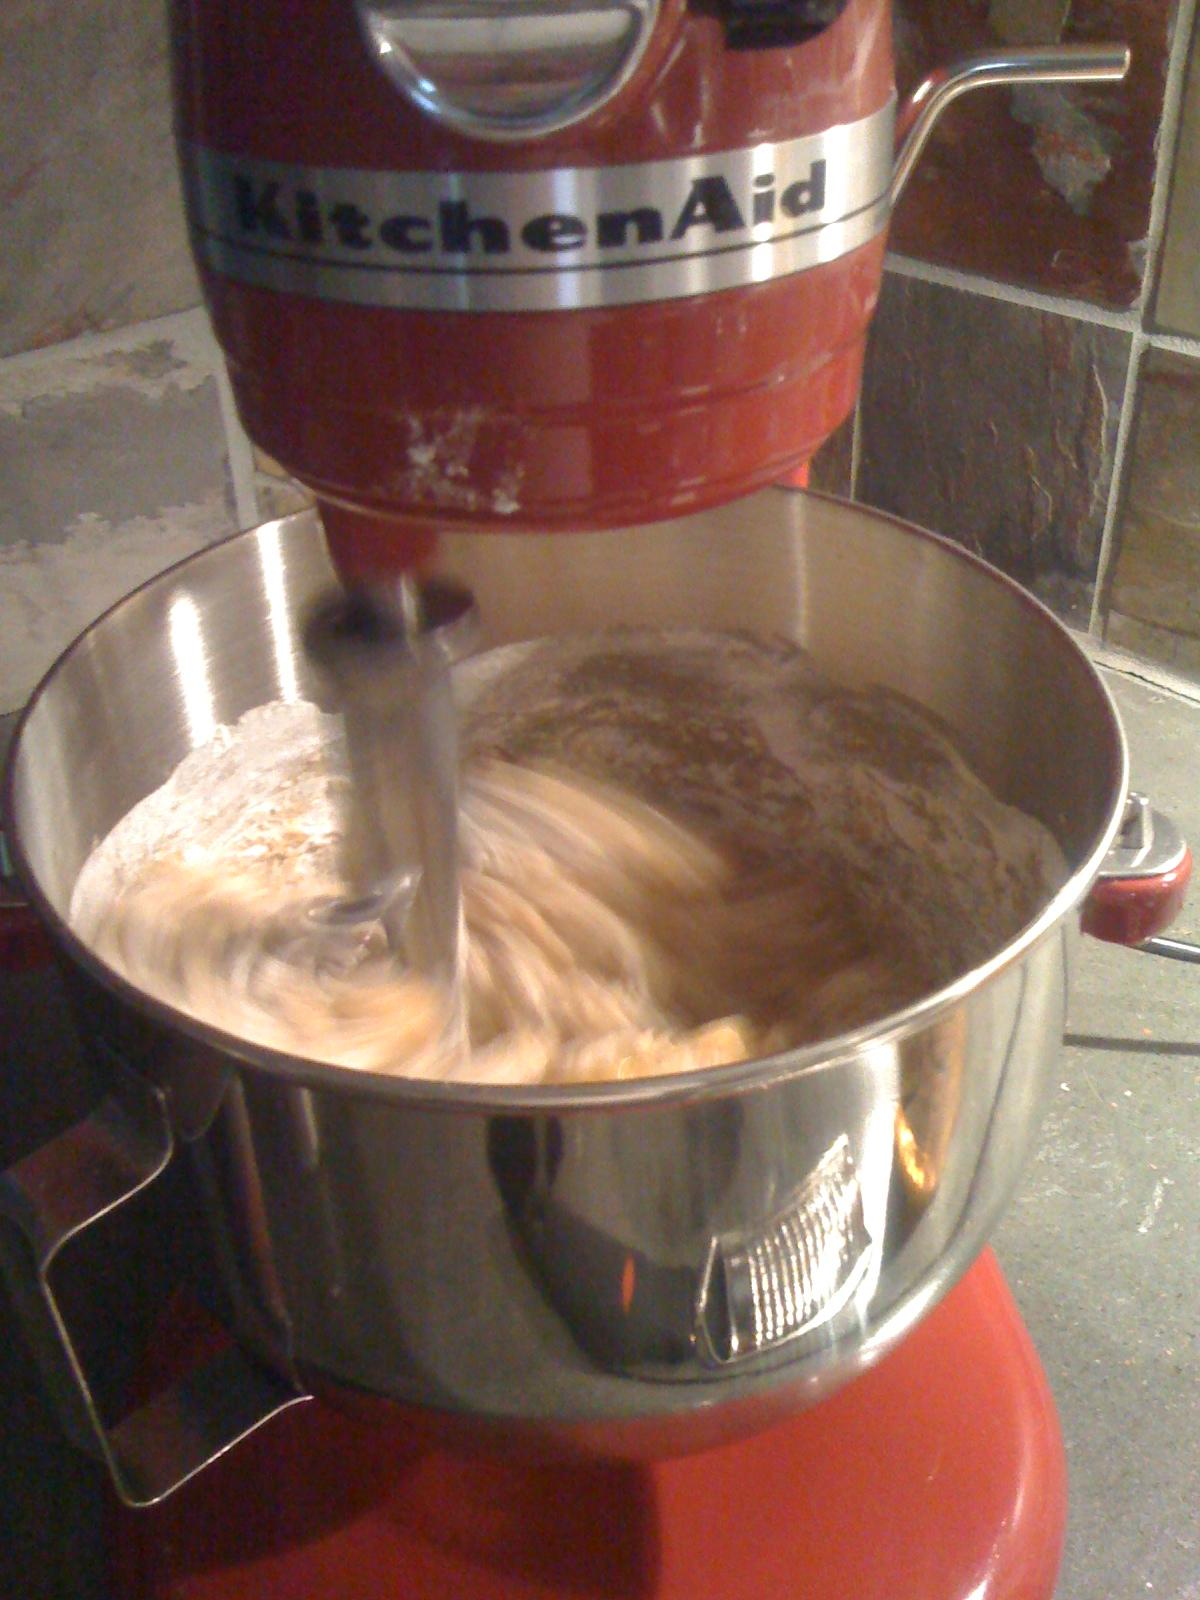 Butternut Squash Bread in the Mixer